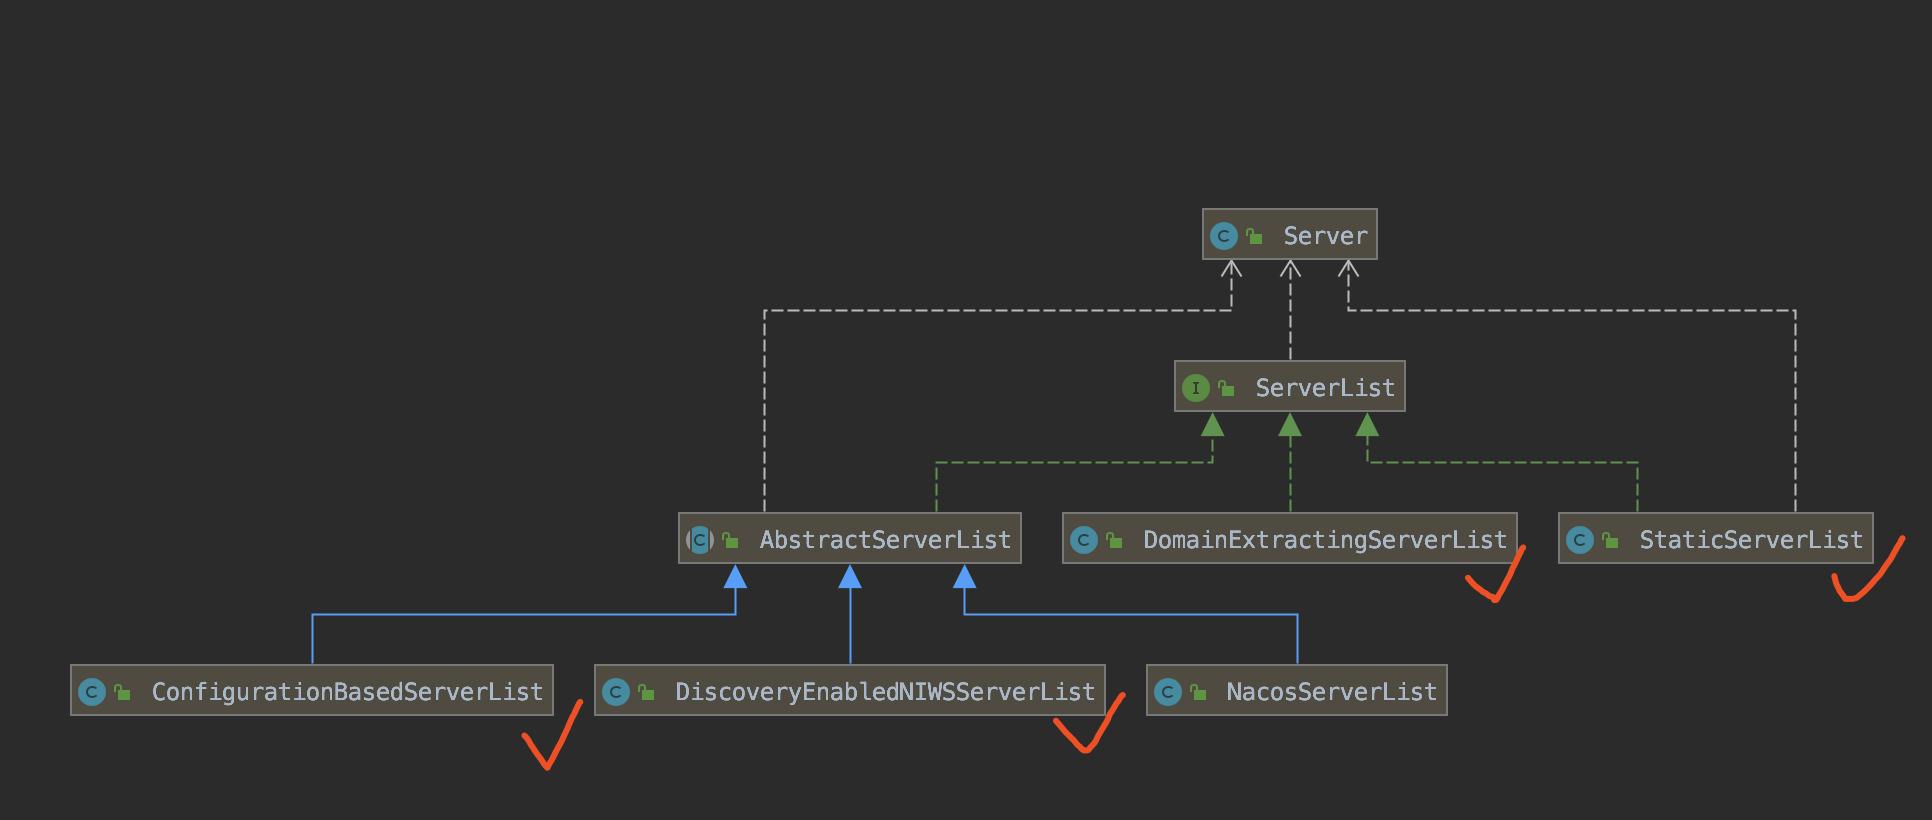 ServerList 类图